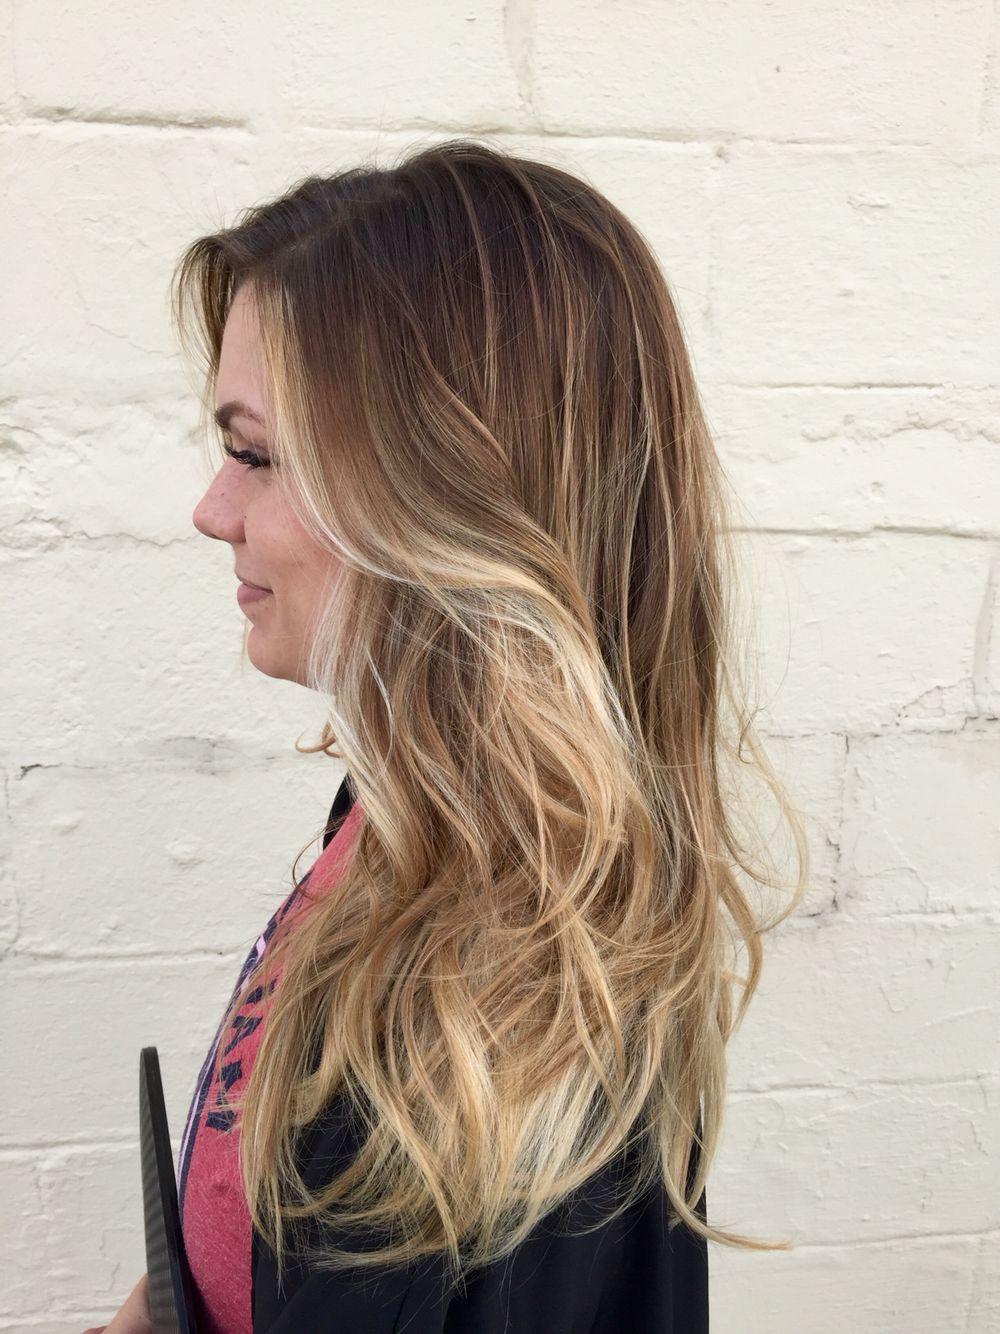 Low Maintenance Blonde Hair With Light Blonde Balayage D Highlights Instagram Marissadanell Balayage Hair Blonde Medium Balayage Hair Blonde Blonde Balayage